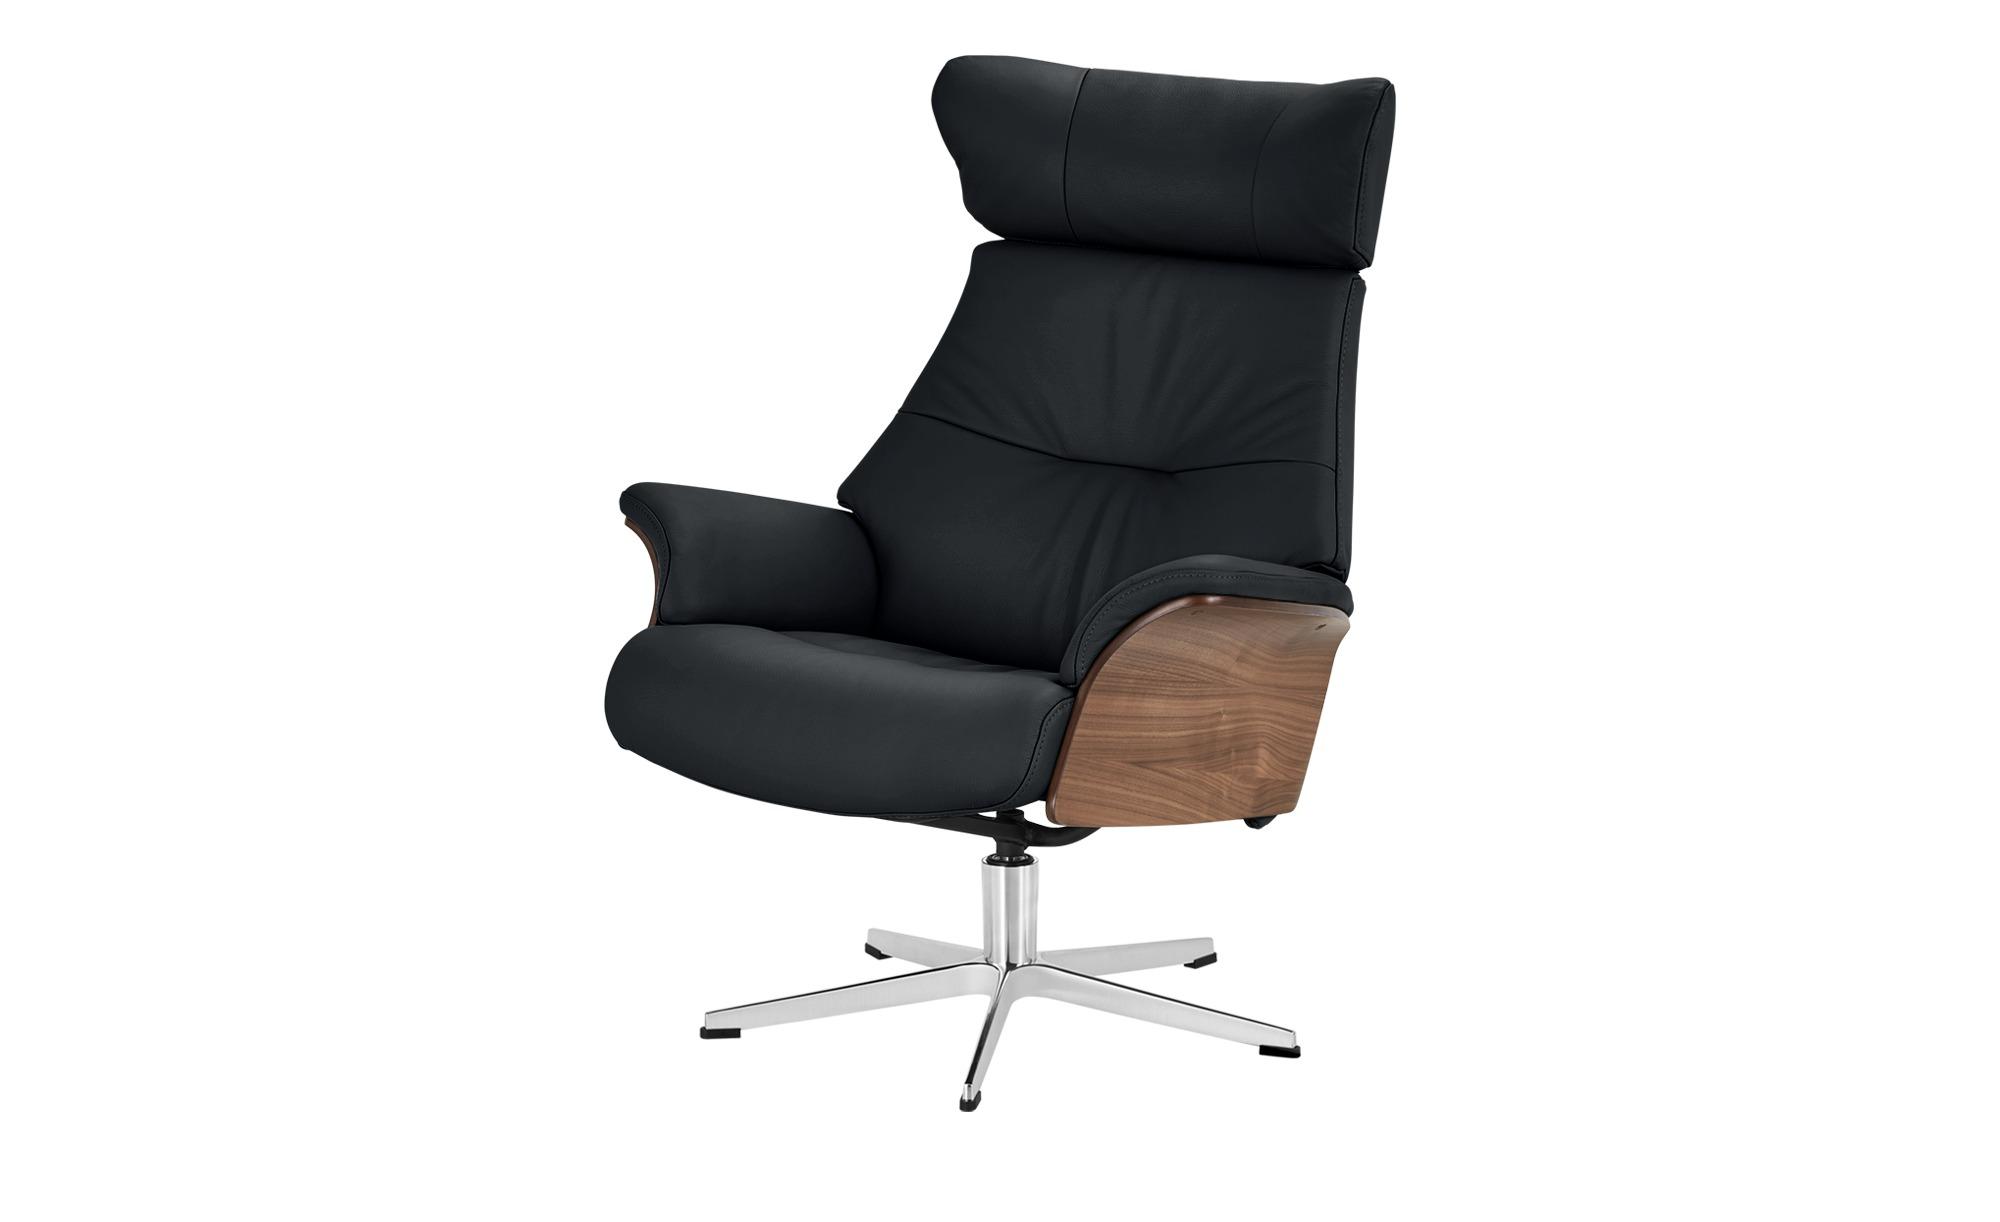 Relaxsessel schwarz - Leder Air ¦ schwarz ¦ Maße (cm): B: 80 H: 104,5 T: 78 Polstermöbel > Sessel > Fernsehsessel - Höffner